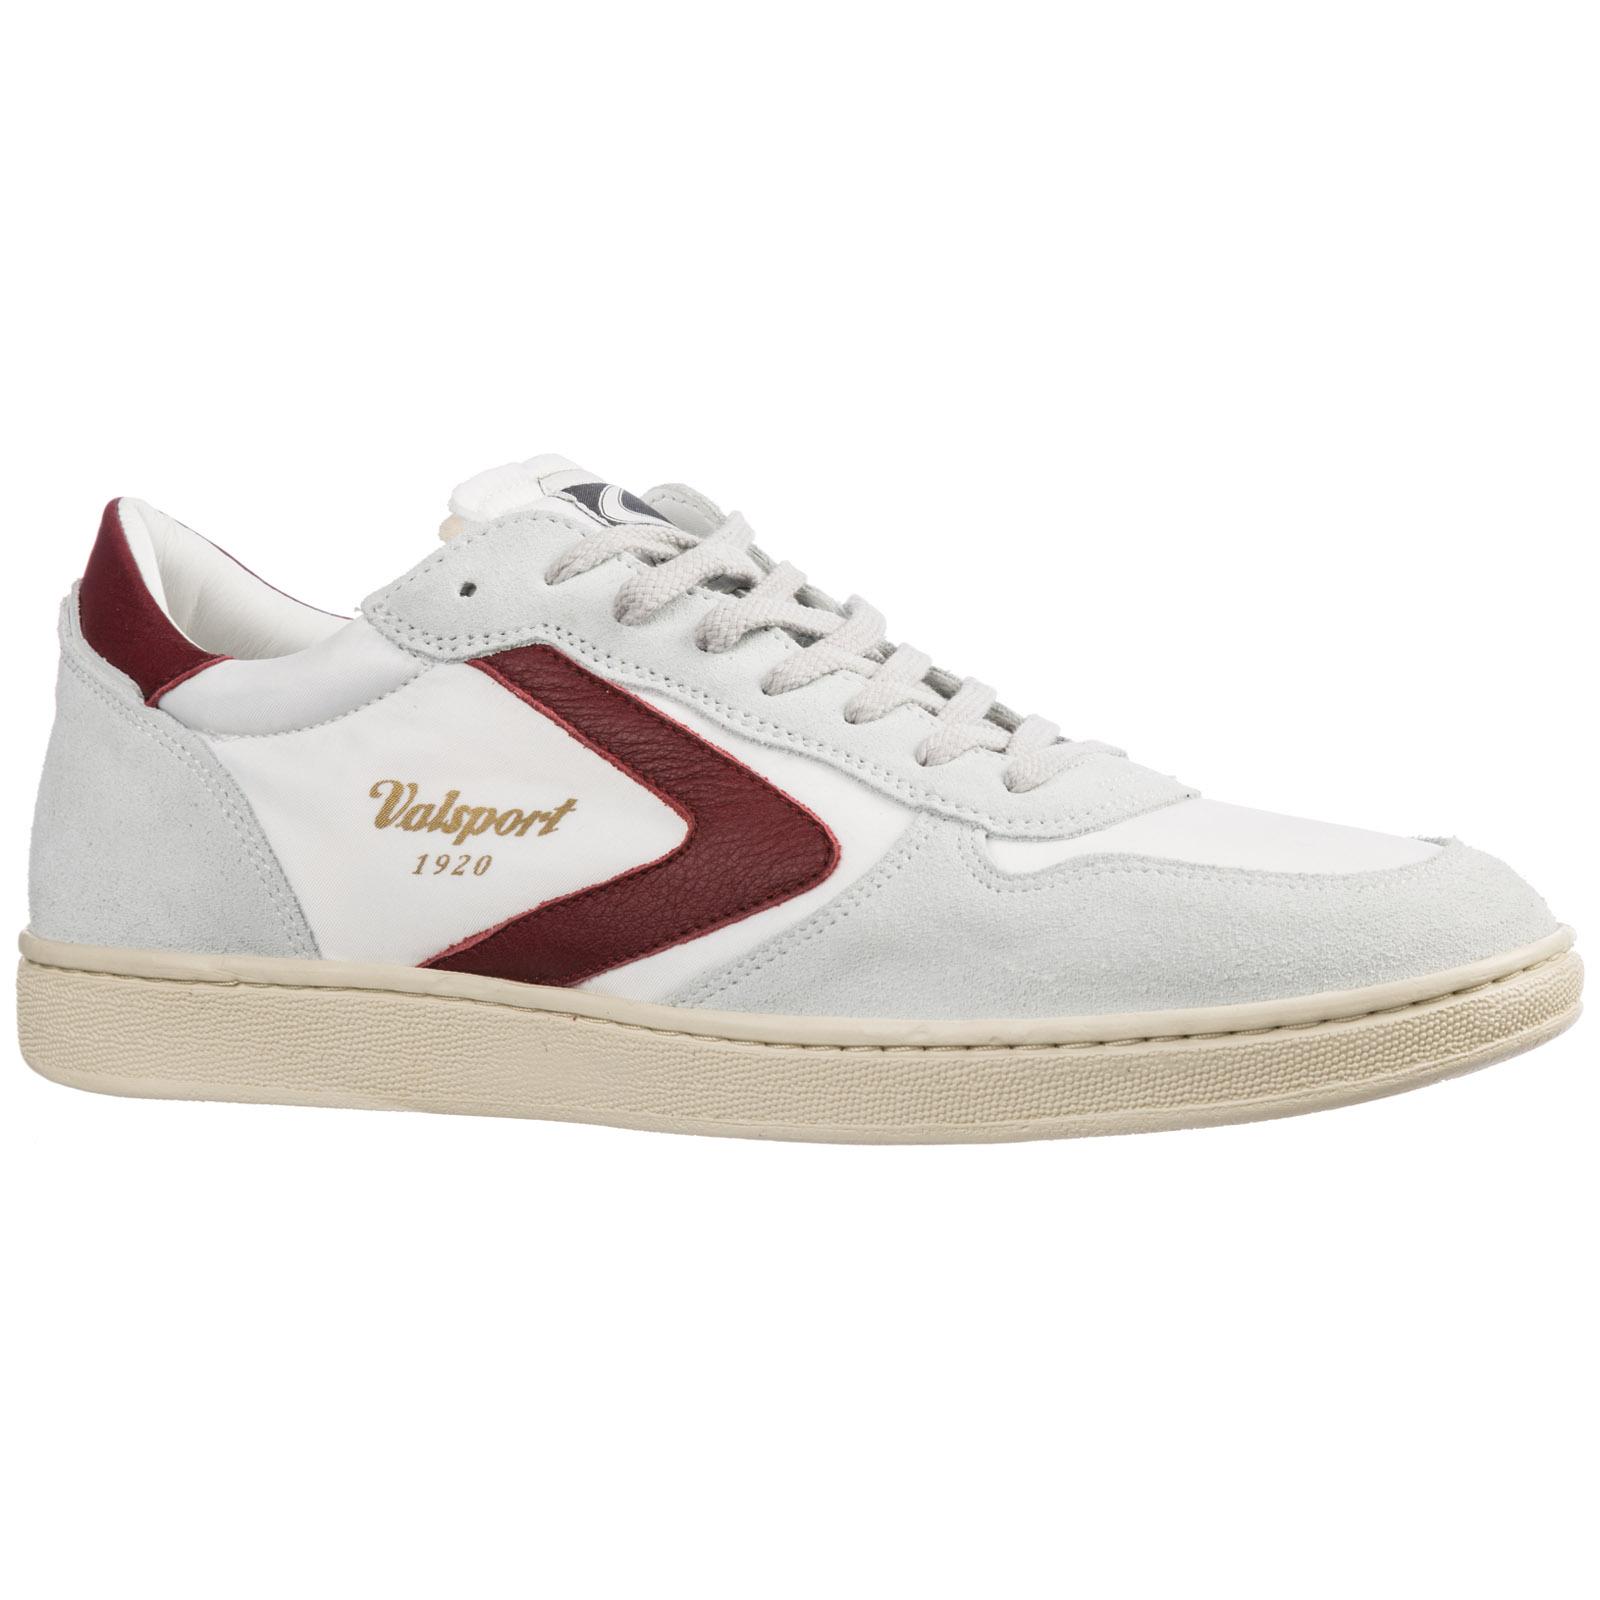 promo code 504b8 864d2 Scarpe sneakers uomo camoscio davis